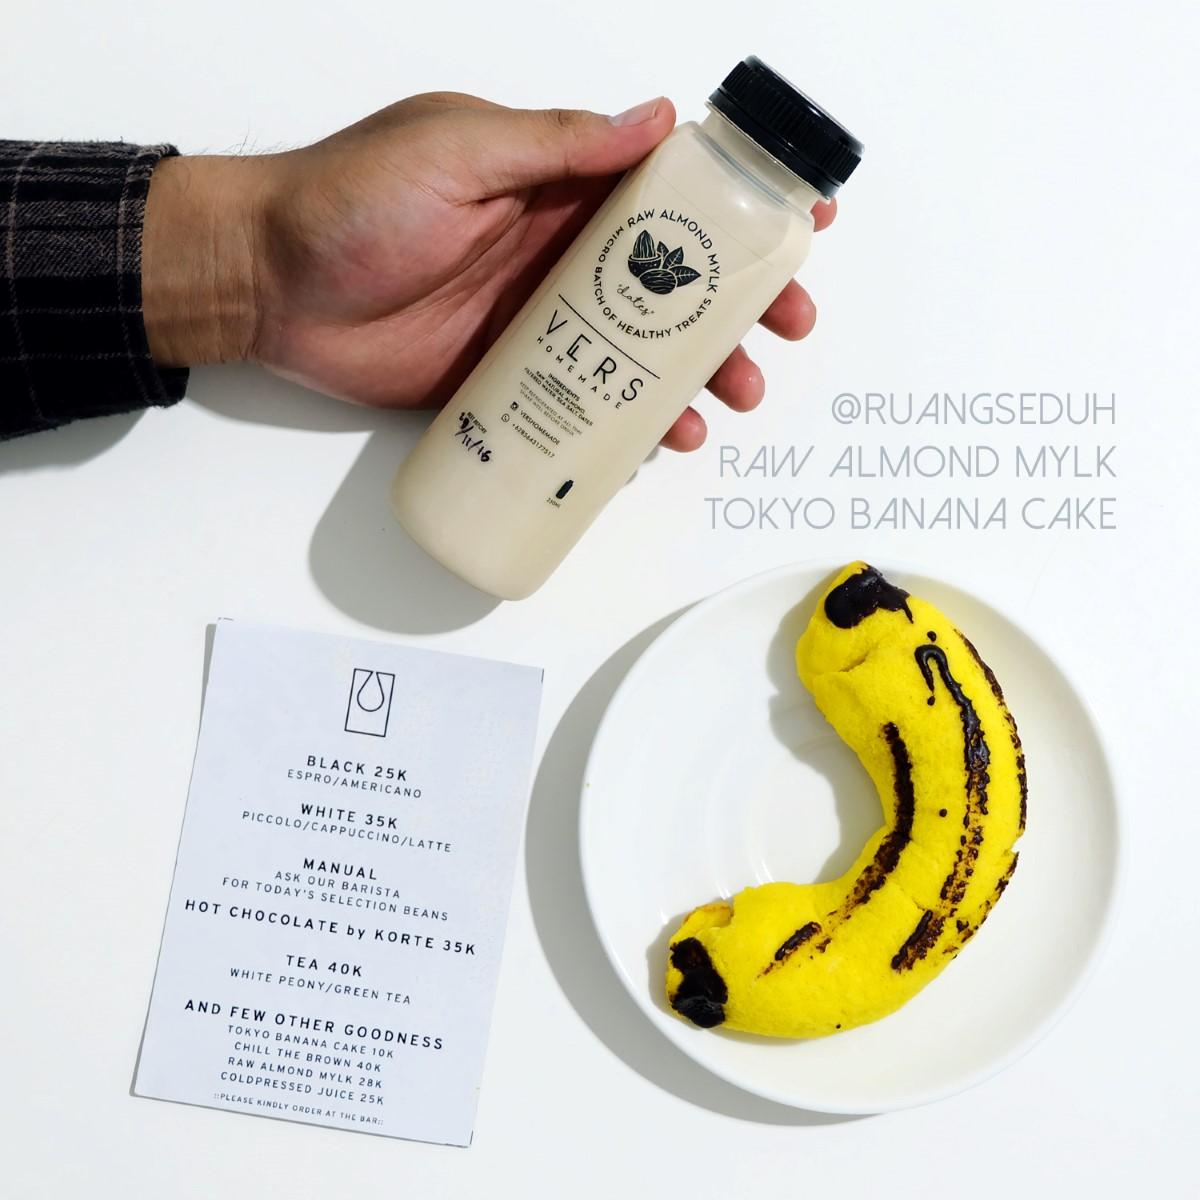 kafe-unik-jogja-ruang-seduh-tokyo-banana-cake-ajengmas